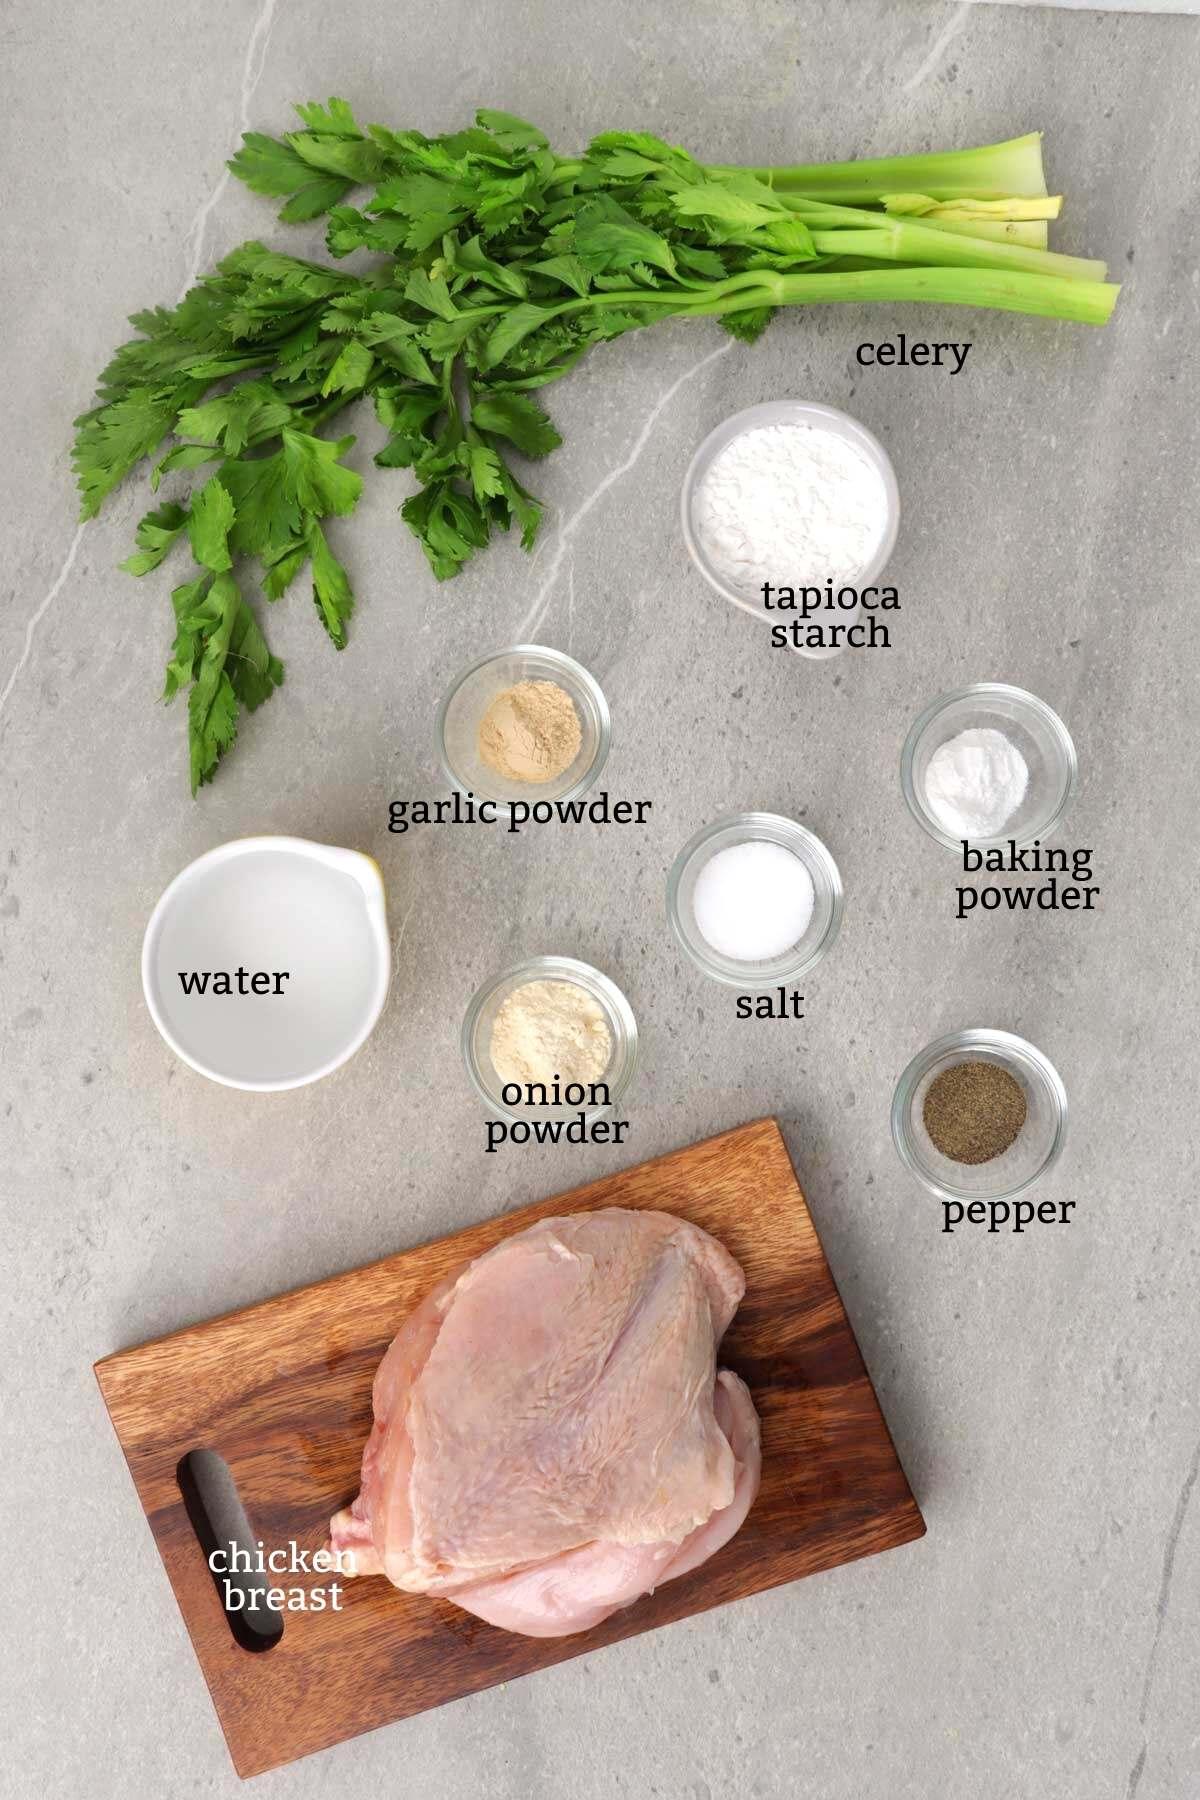 Ingredients for making chicken balls